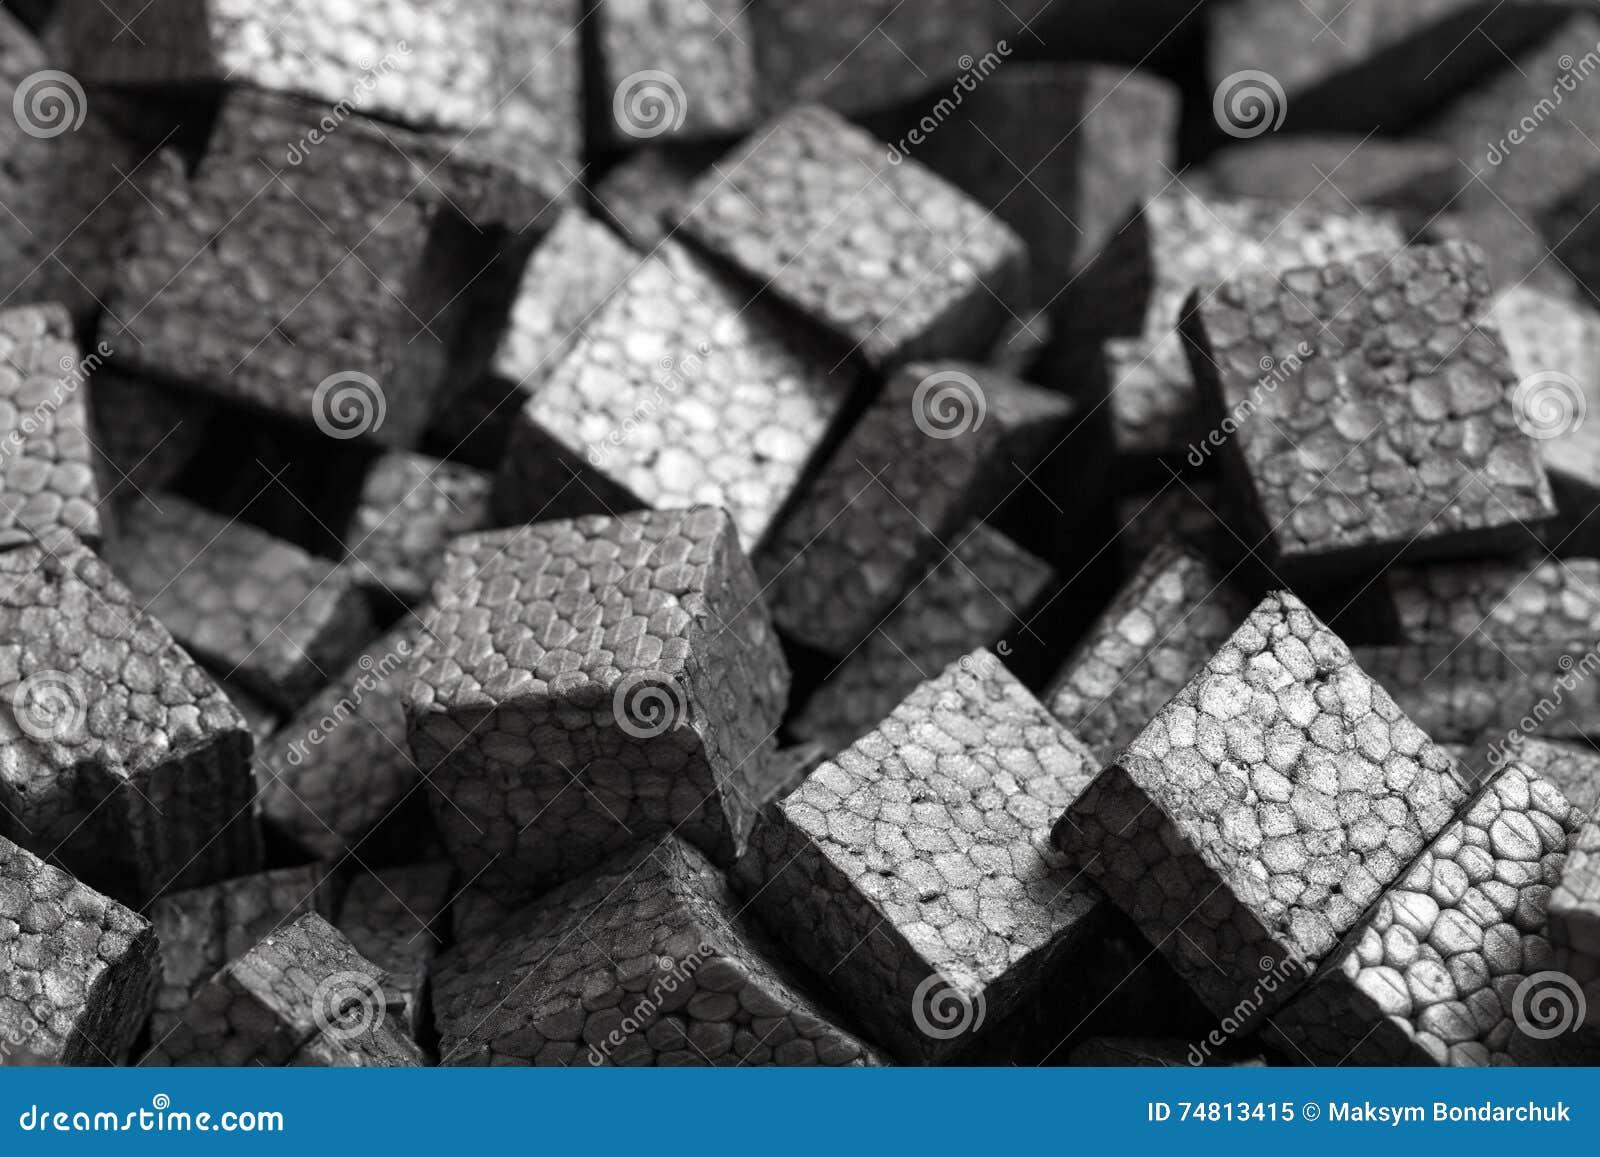 Closeup Background Of Styrofoam Pellets Royalty Free Stock